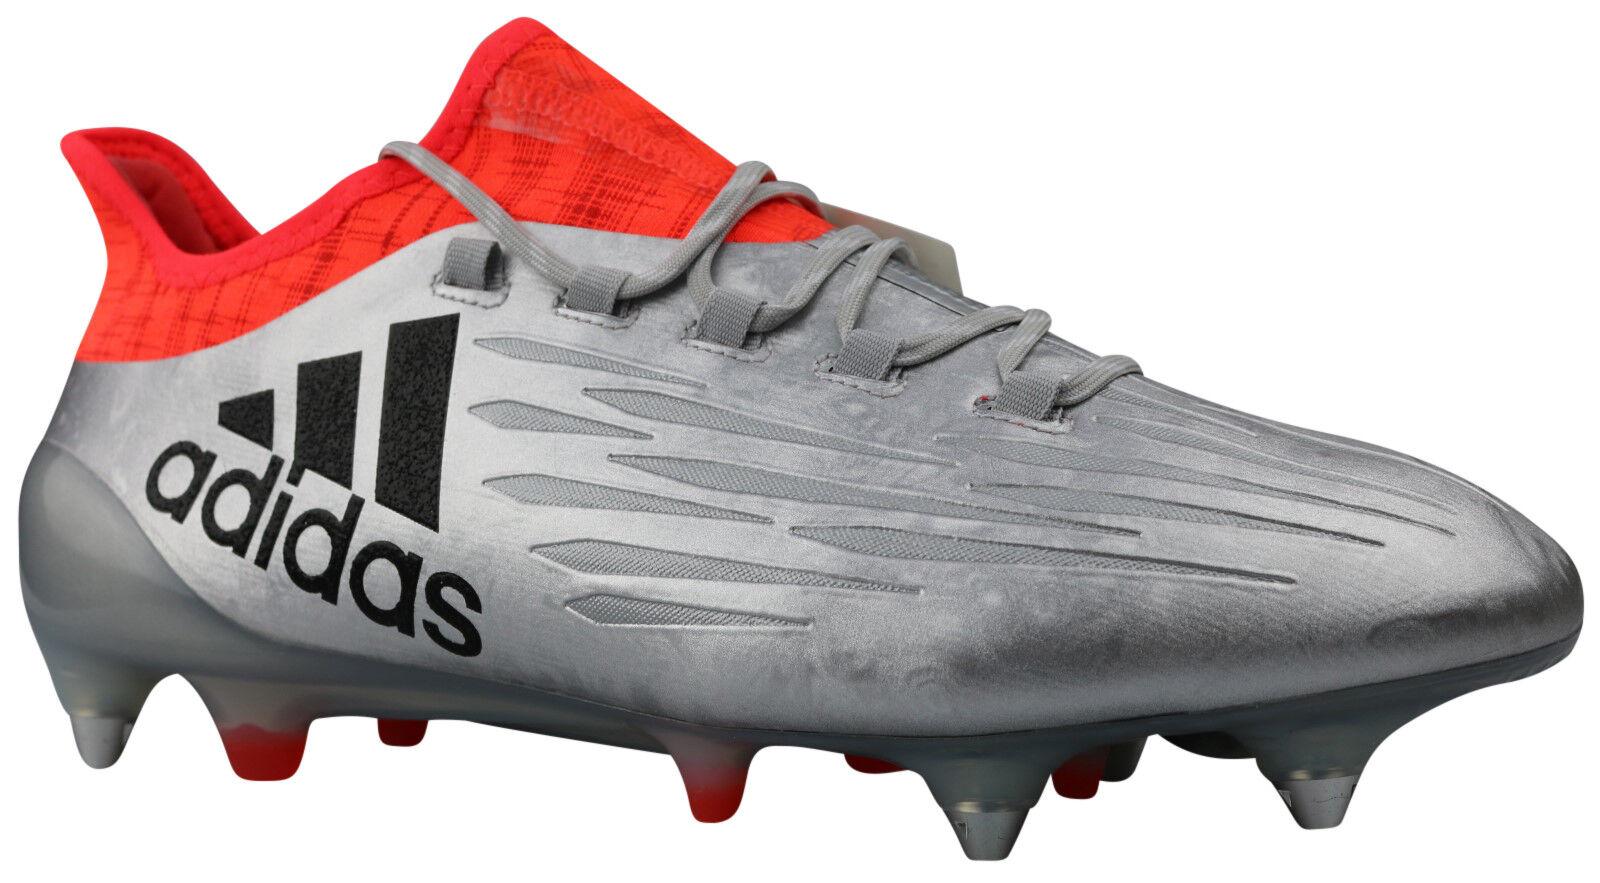 Adidas X 16.1 SG Herren Fußballschuhe S81957 Stollen silber Gr. 42 NEU & OVP